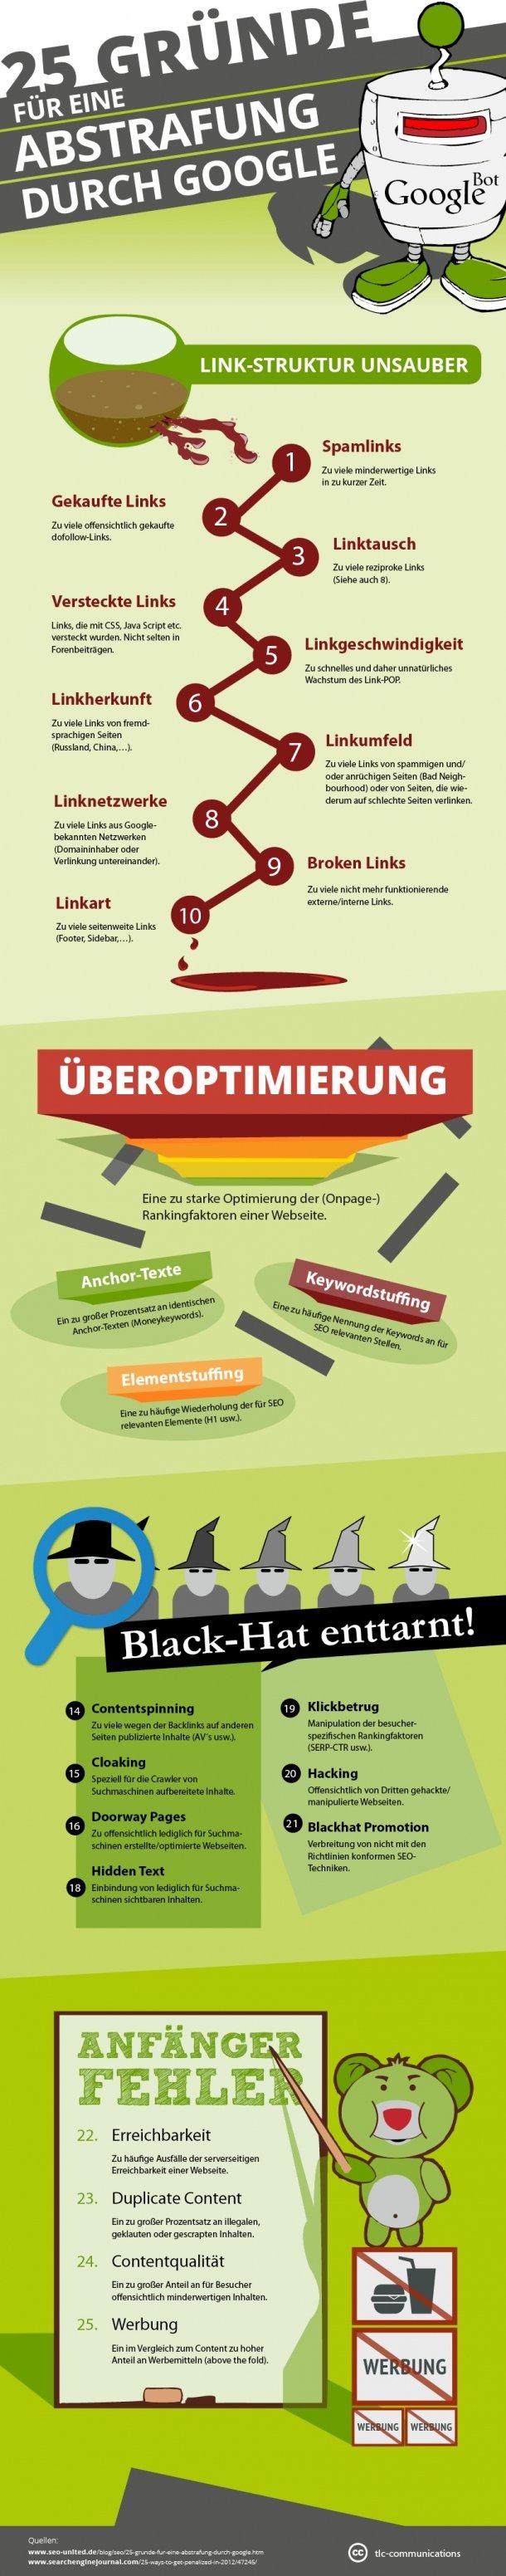 seo_google_abstrafung_infografik